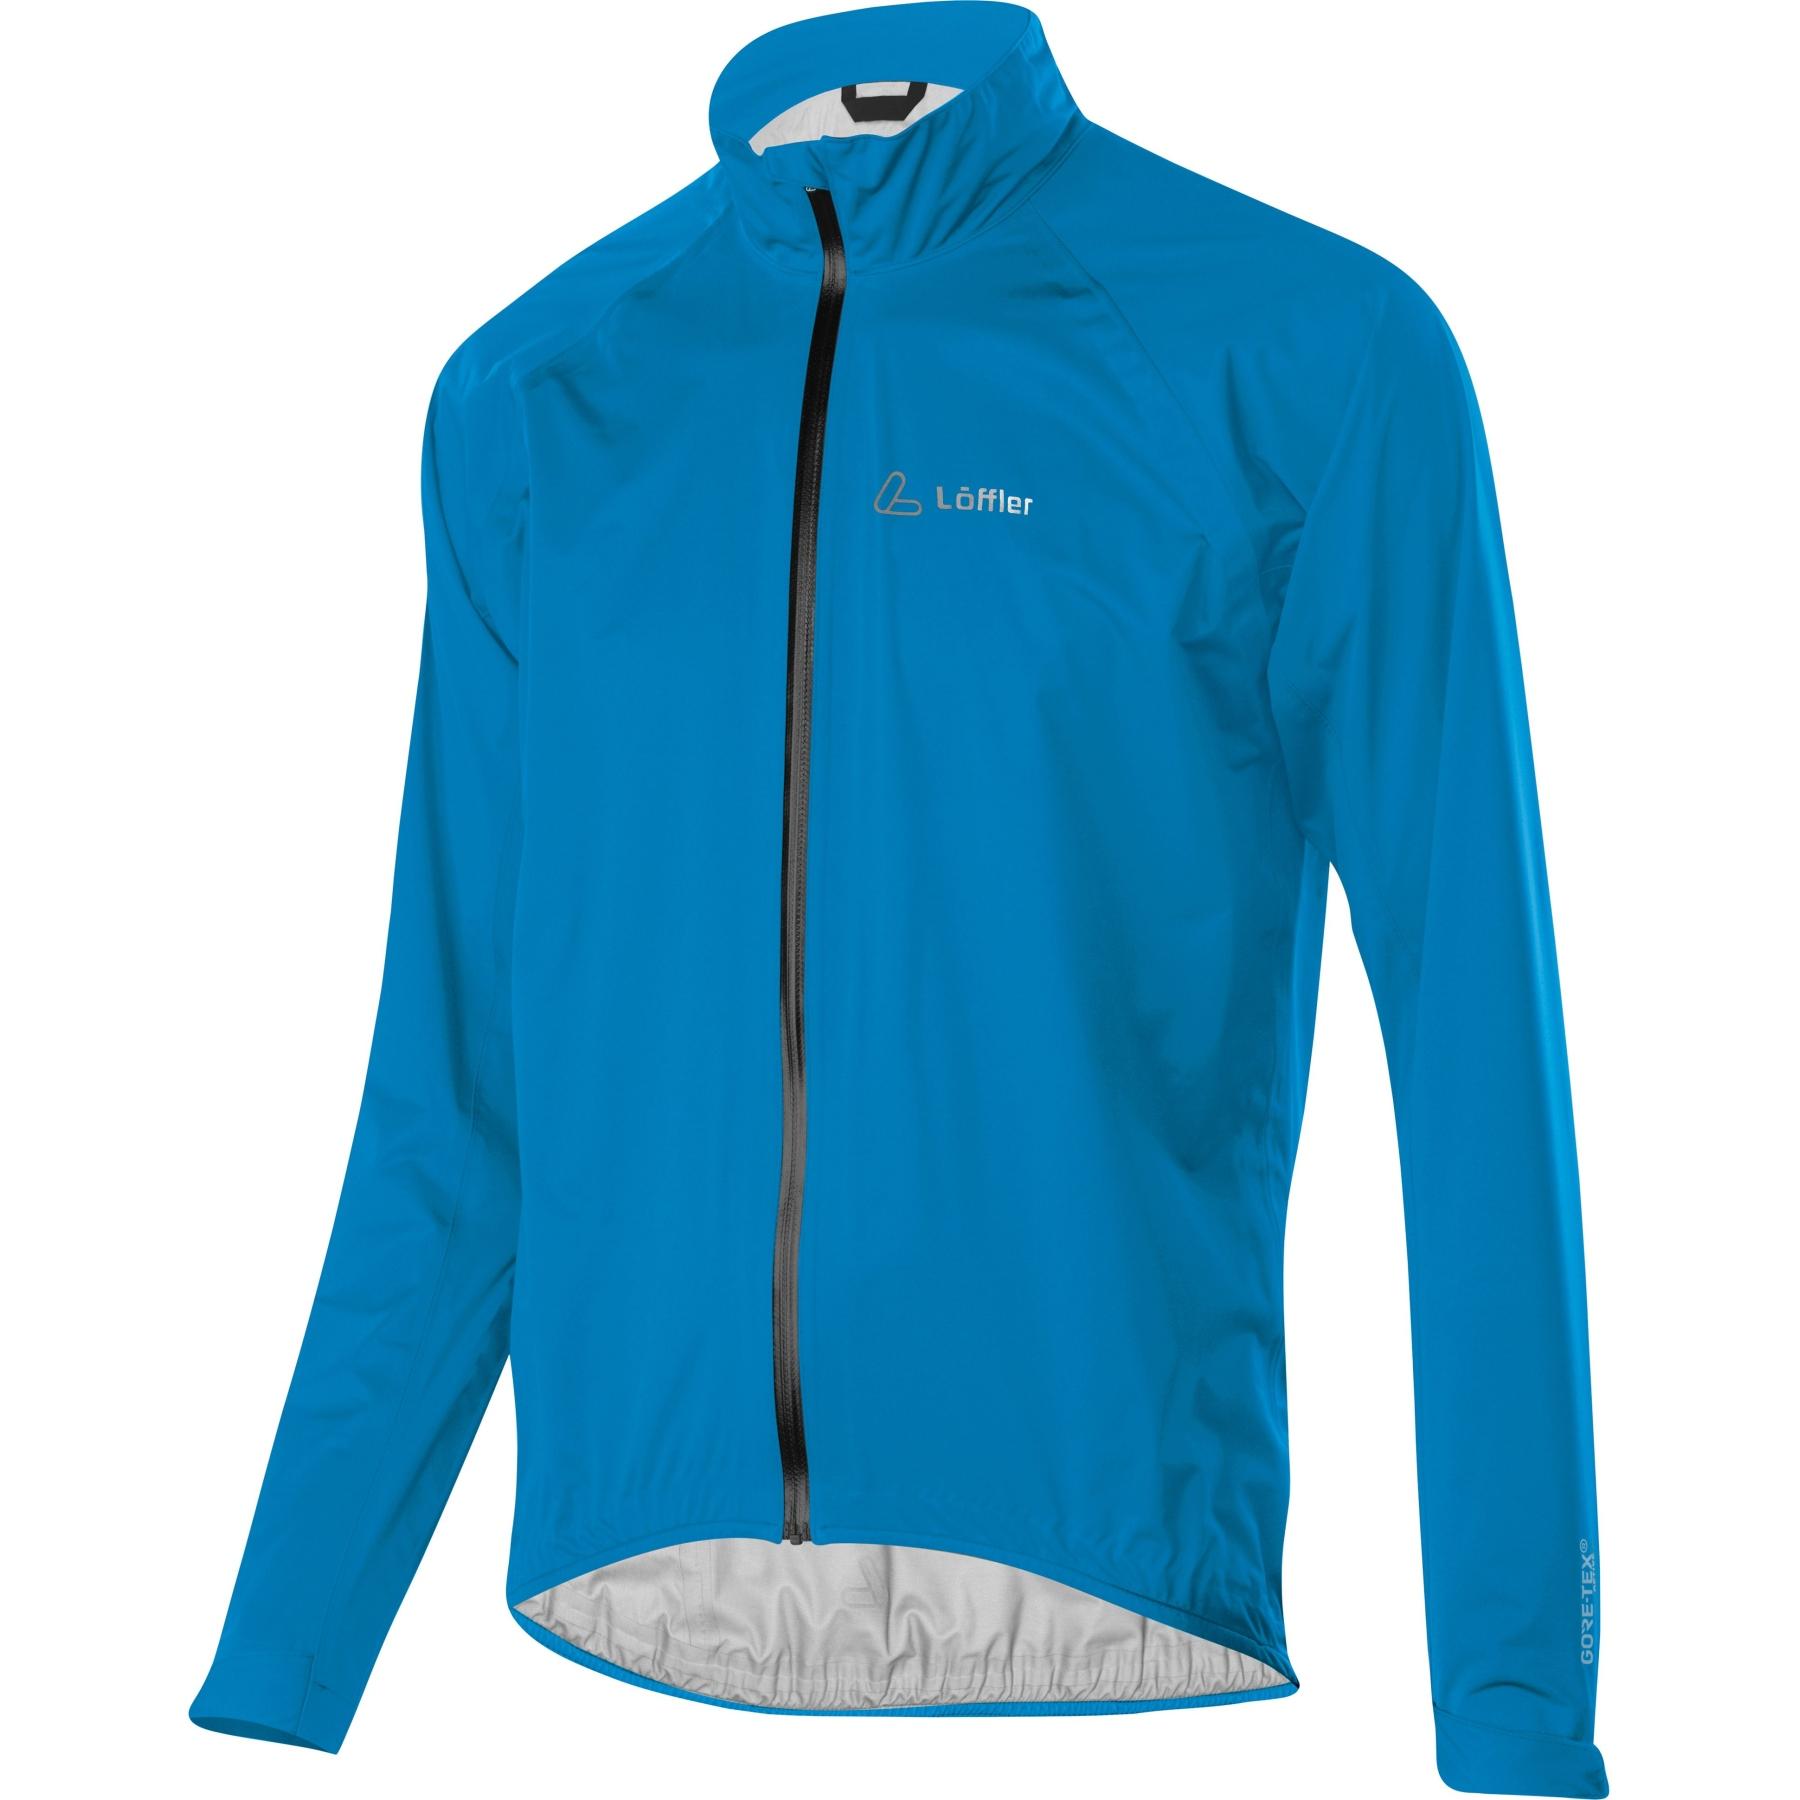 Löffler Bike Jacke Prime GTX Active 21754 - blue lake 426